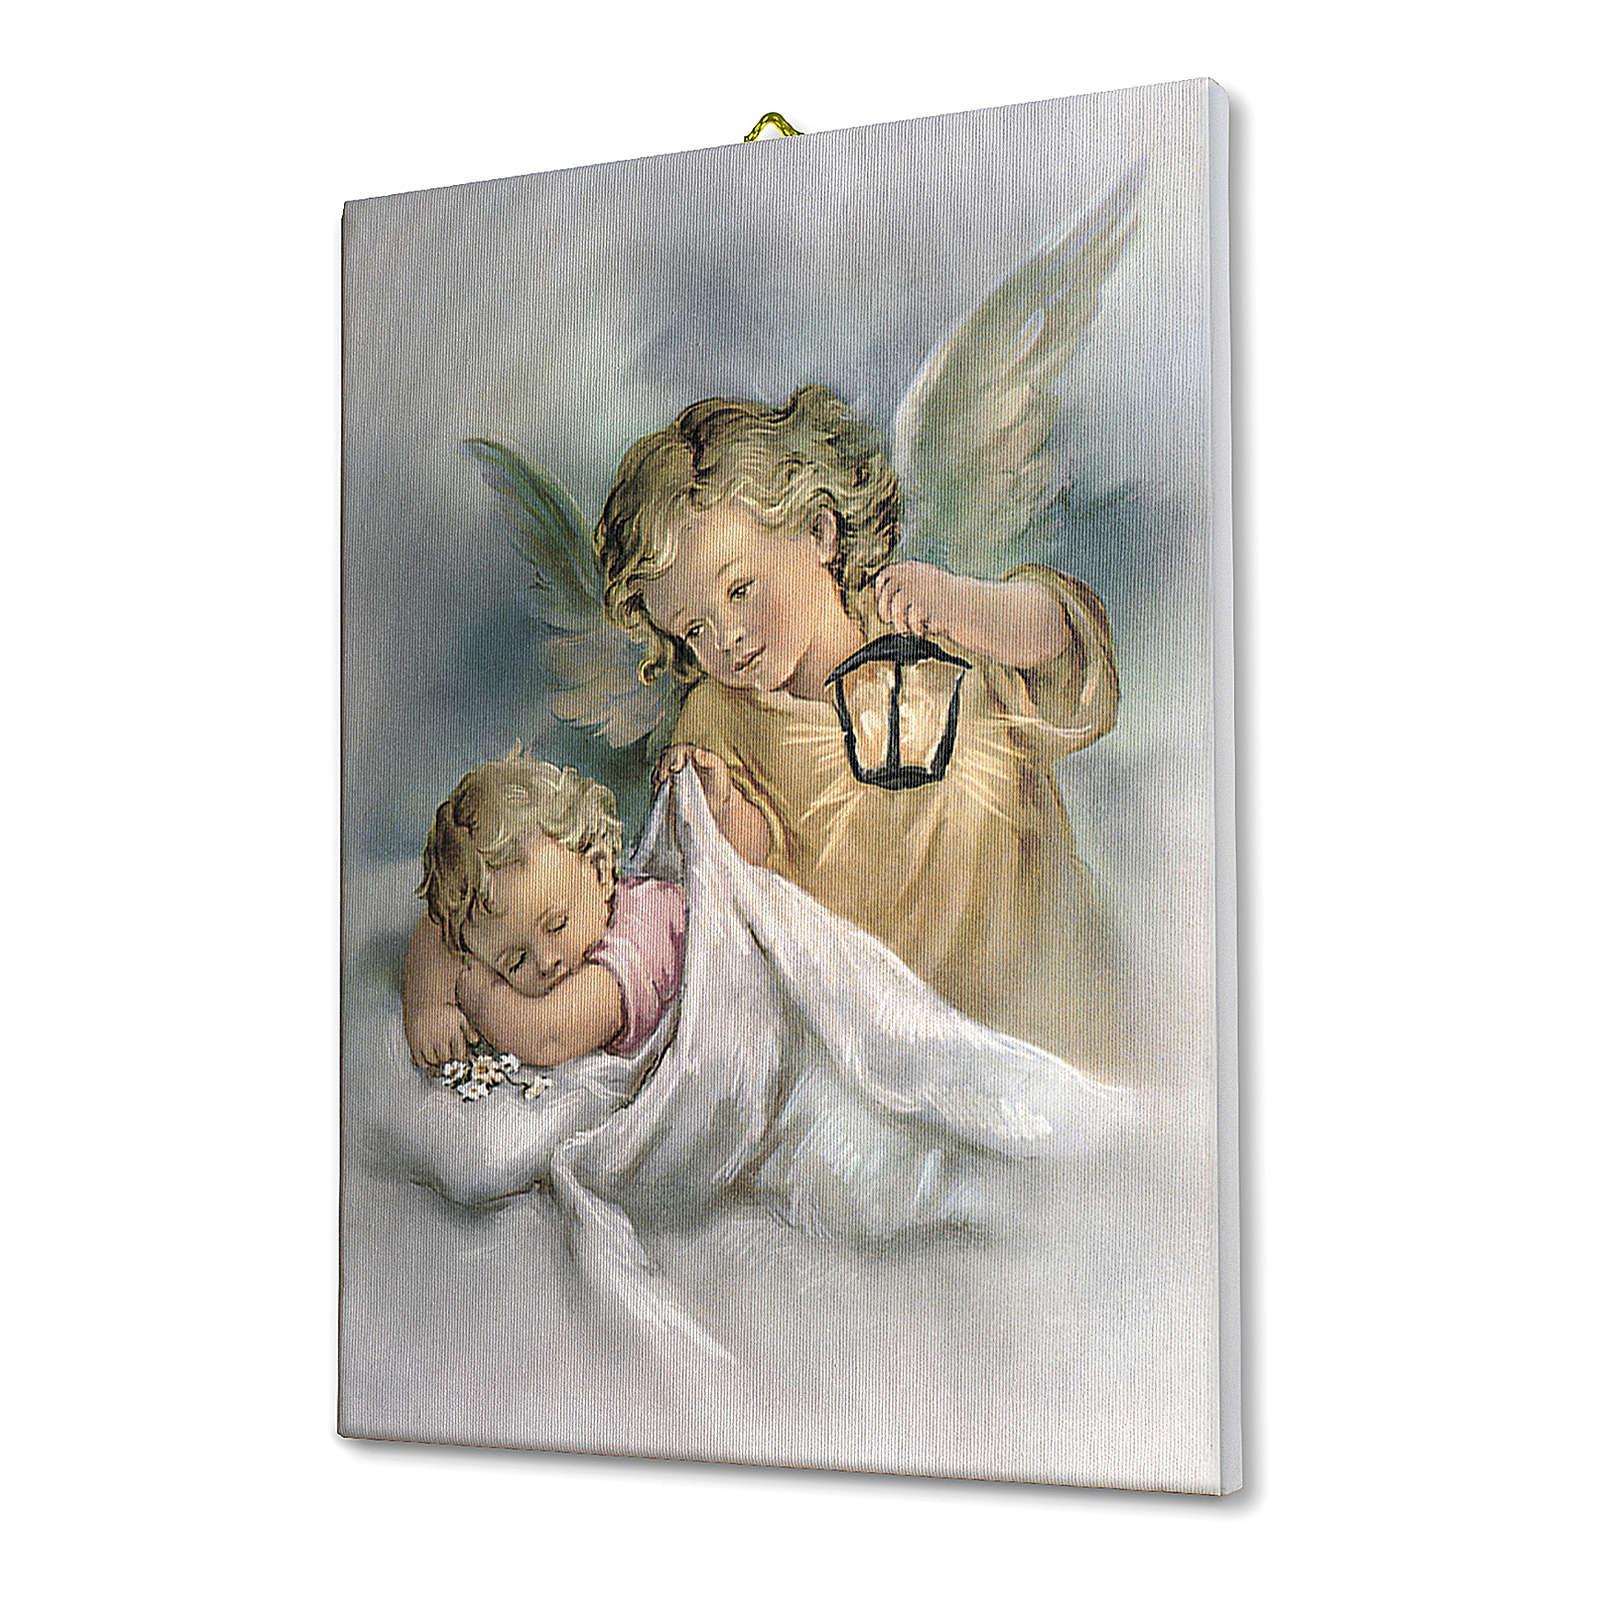 Quadro su tela pittorica Angelo Custode con Lanterna 40x30 cm 3